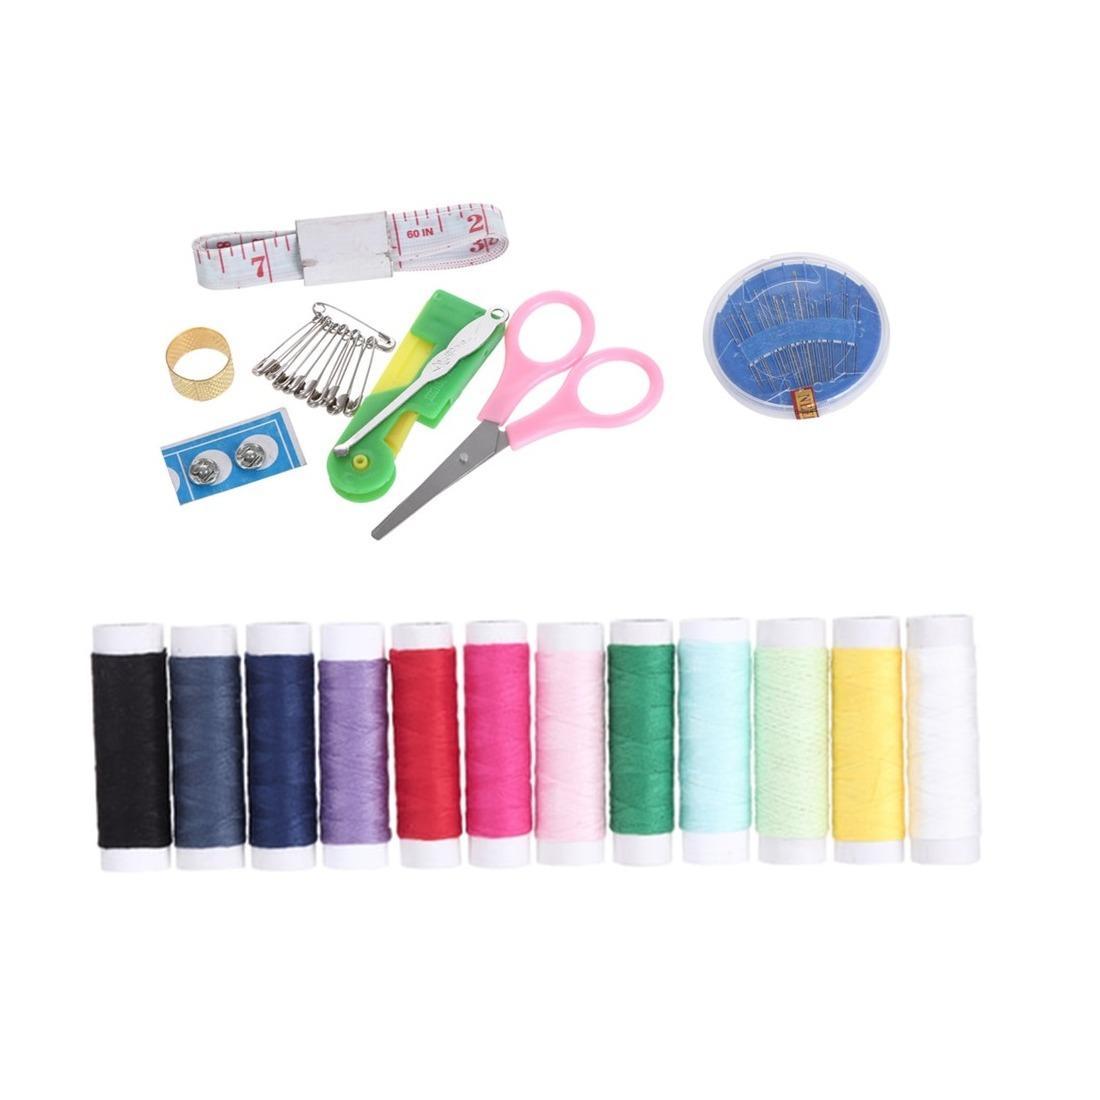 Kehebatan Sewing Kit Box Paket Perlengkapan Menjahit Lengkap Dengan Alat Jahit Set Peralatan Accessories